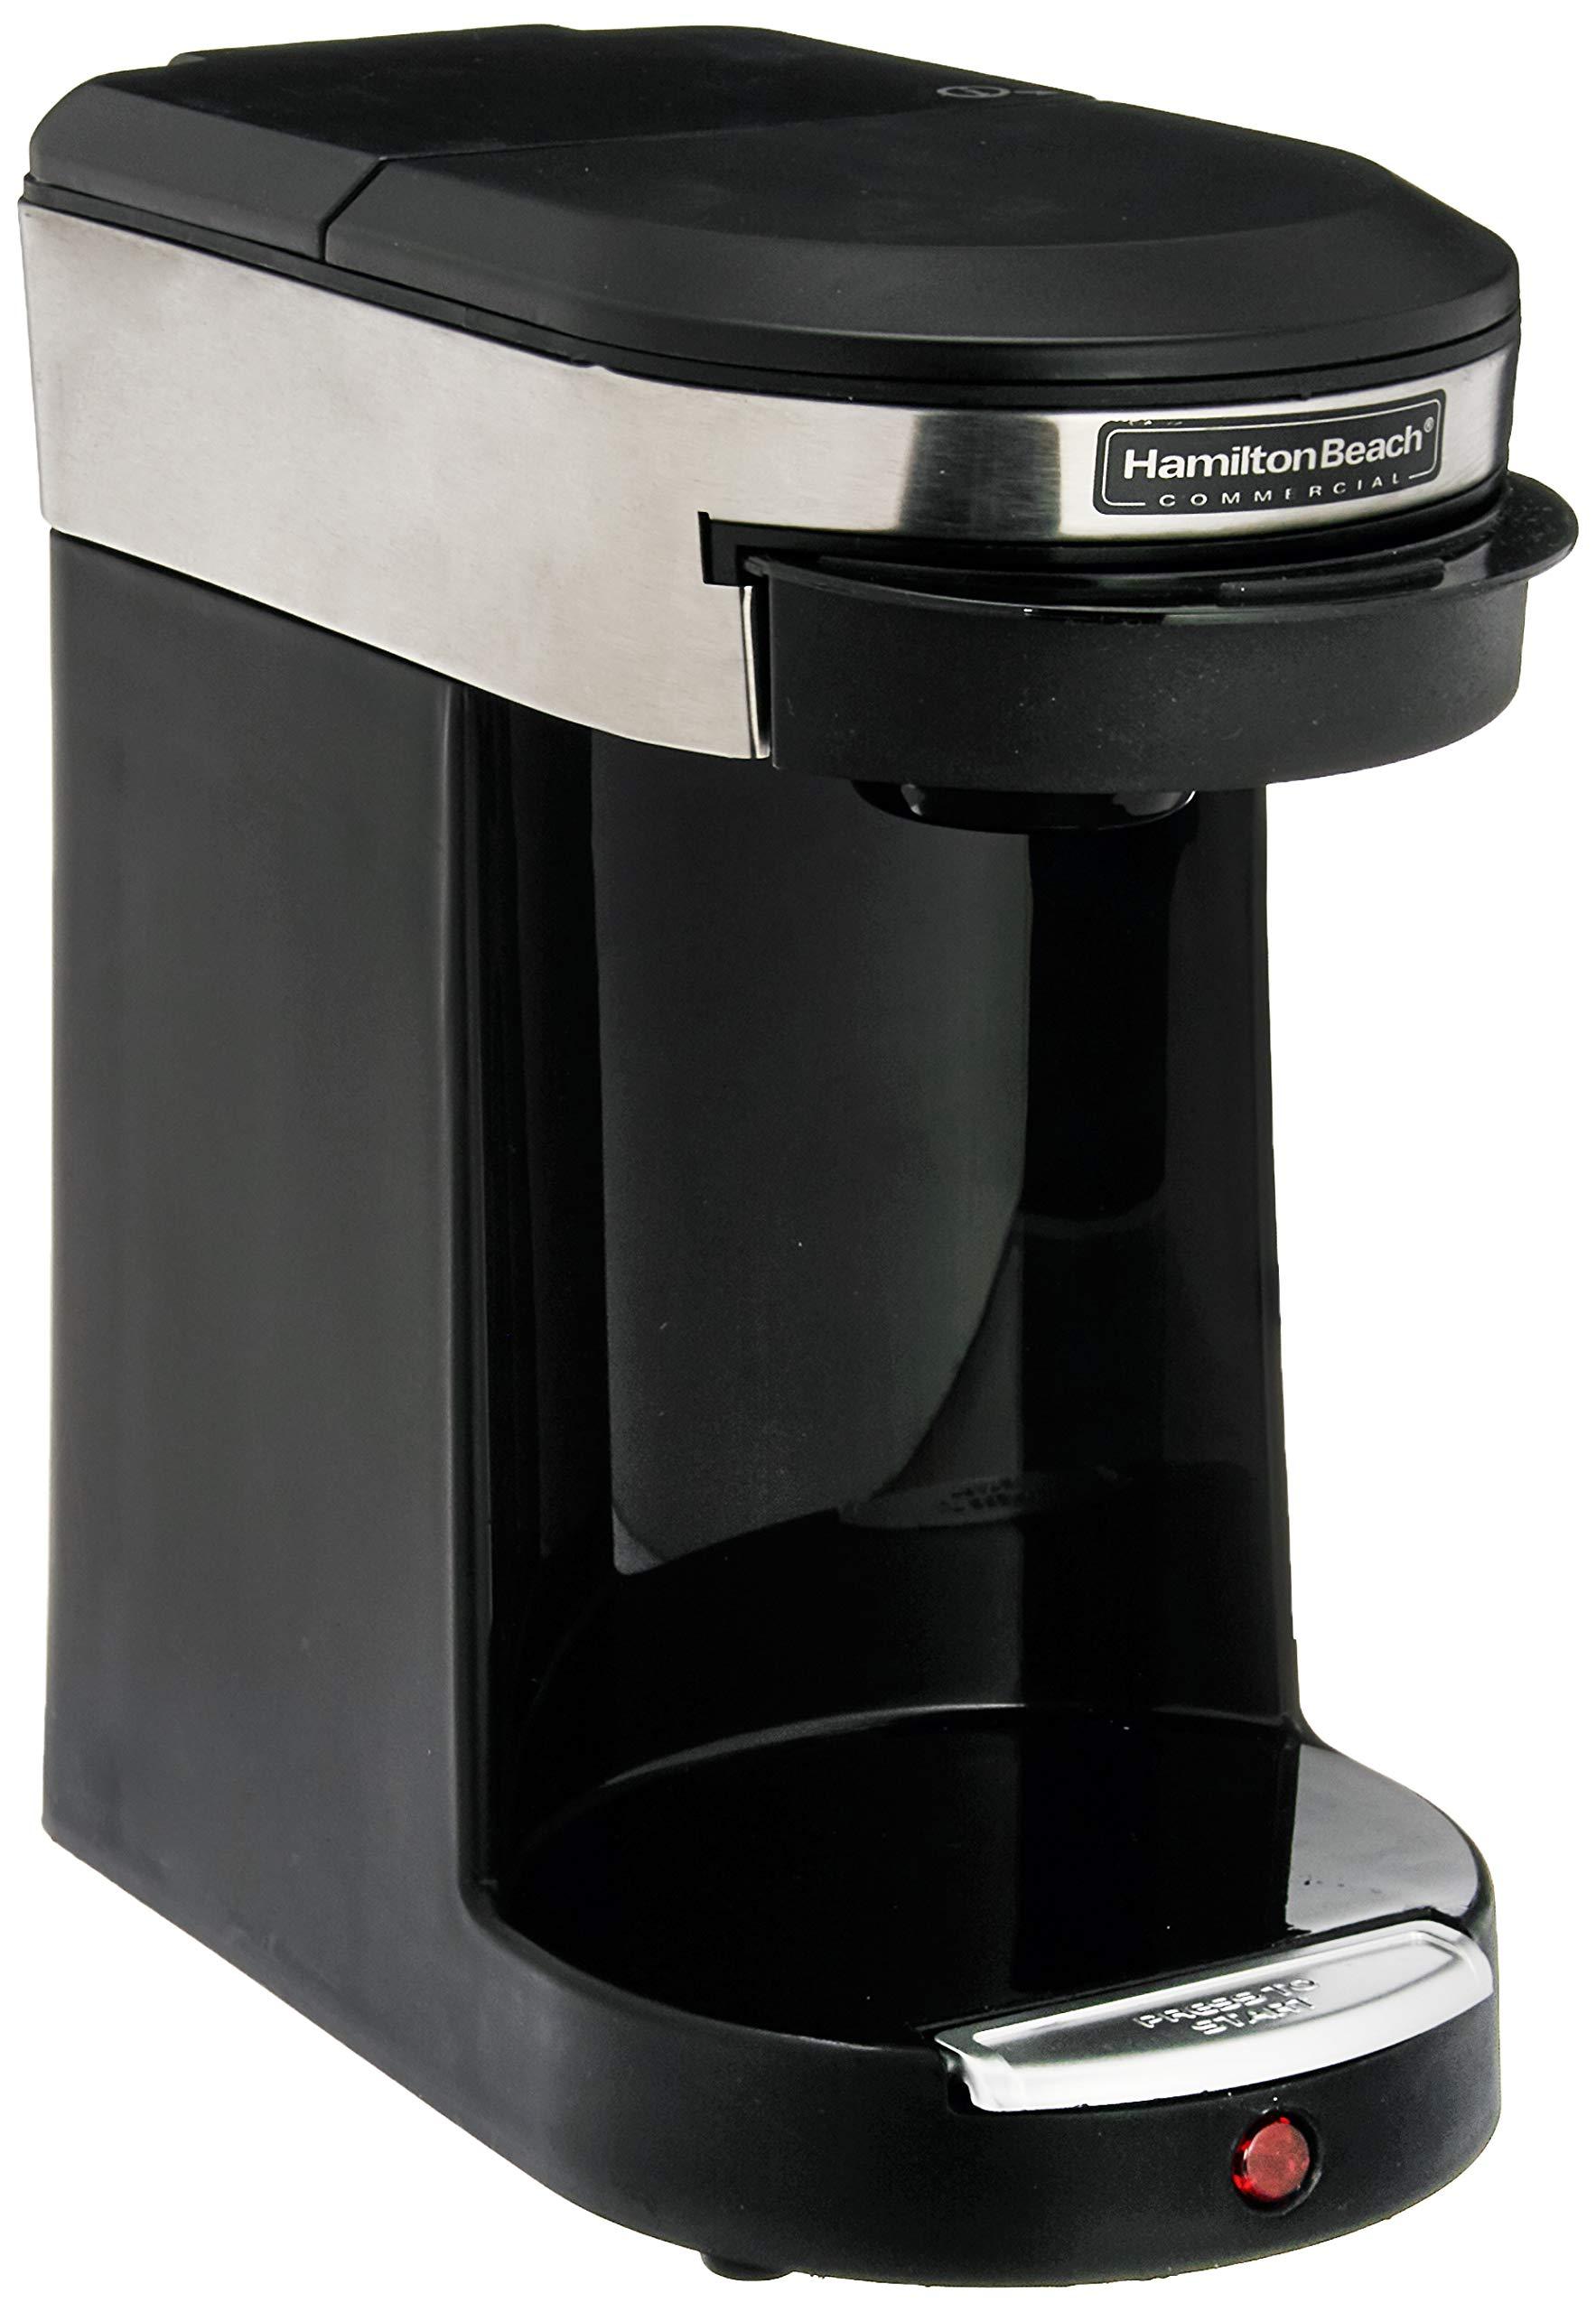 Hamilton Beach SMALL APPLIANCES 1030390 Stainless Steel/Black Beach Single Cup Hospitality Coffeemaker with 3-Minute Brew Time by Hamilton Beach